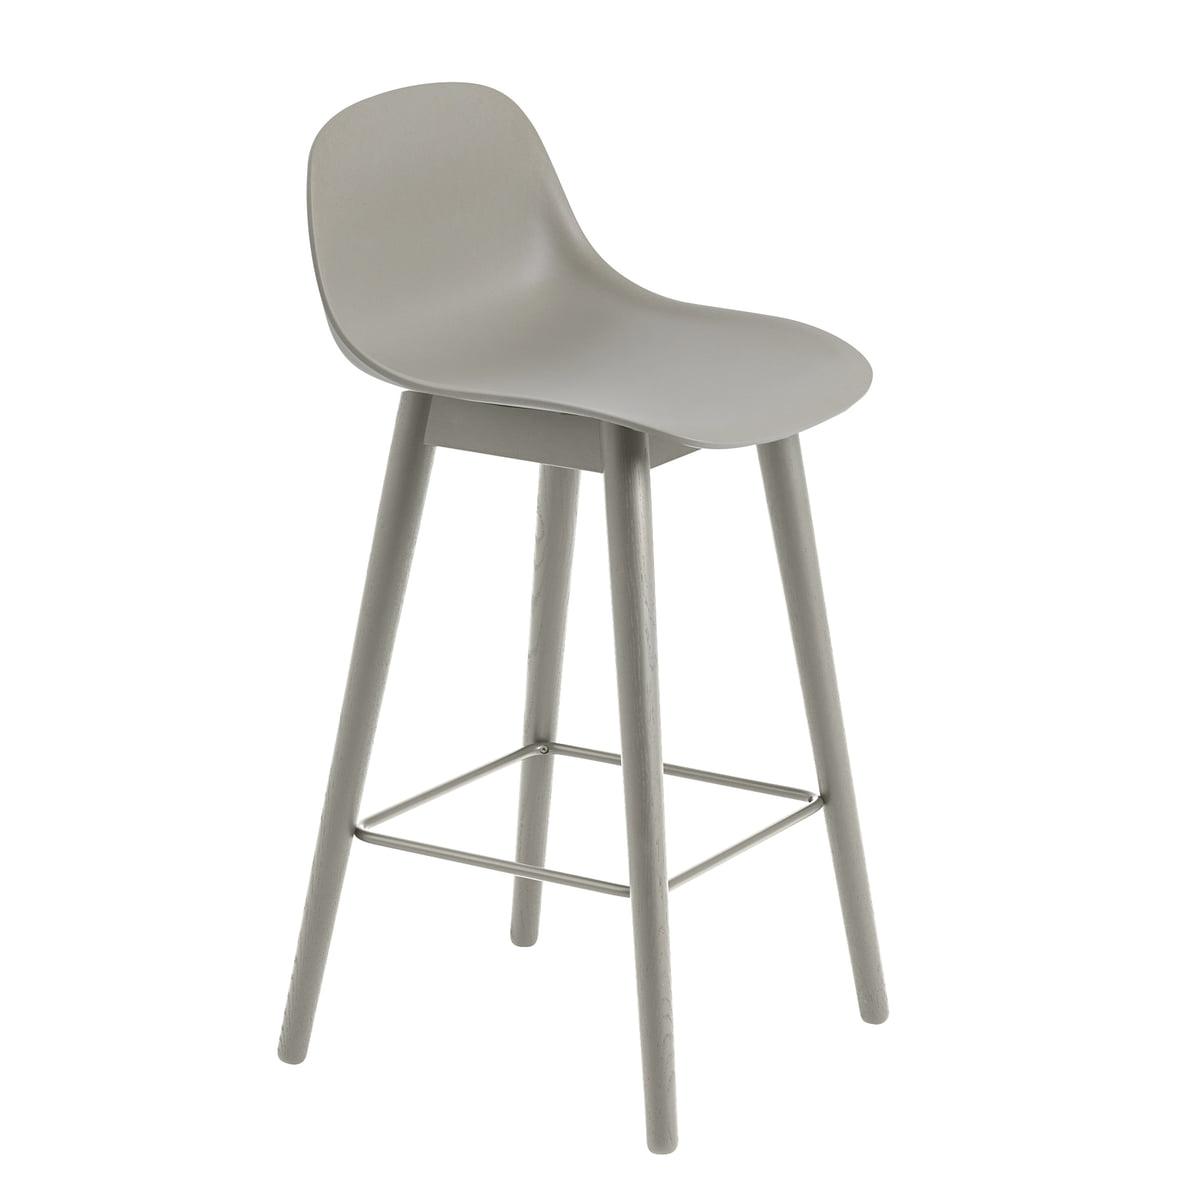 beautiful sitzbank k che mit lehne images. Black Bedroom Furniture Sets. Home Design Ideas